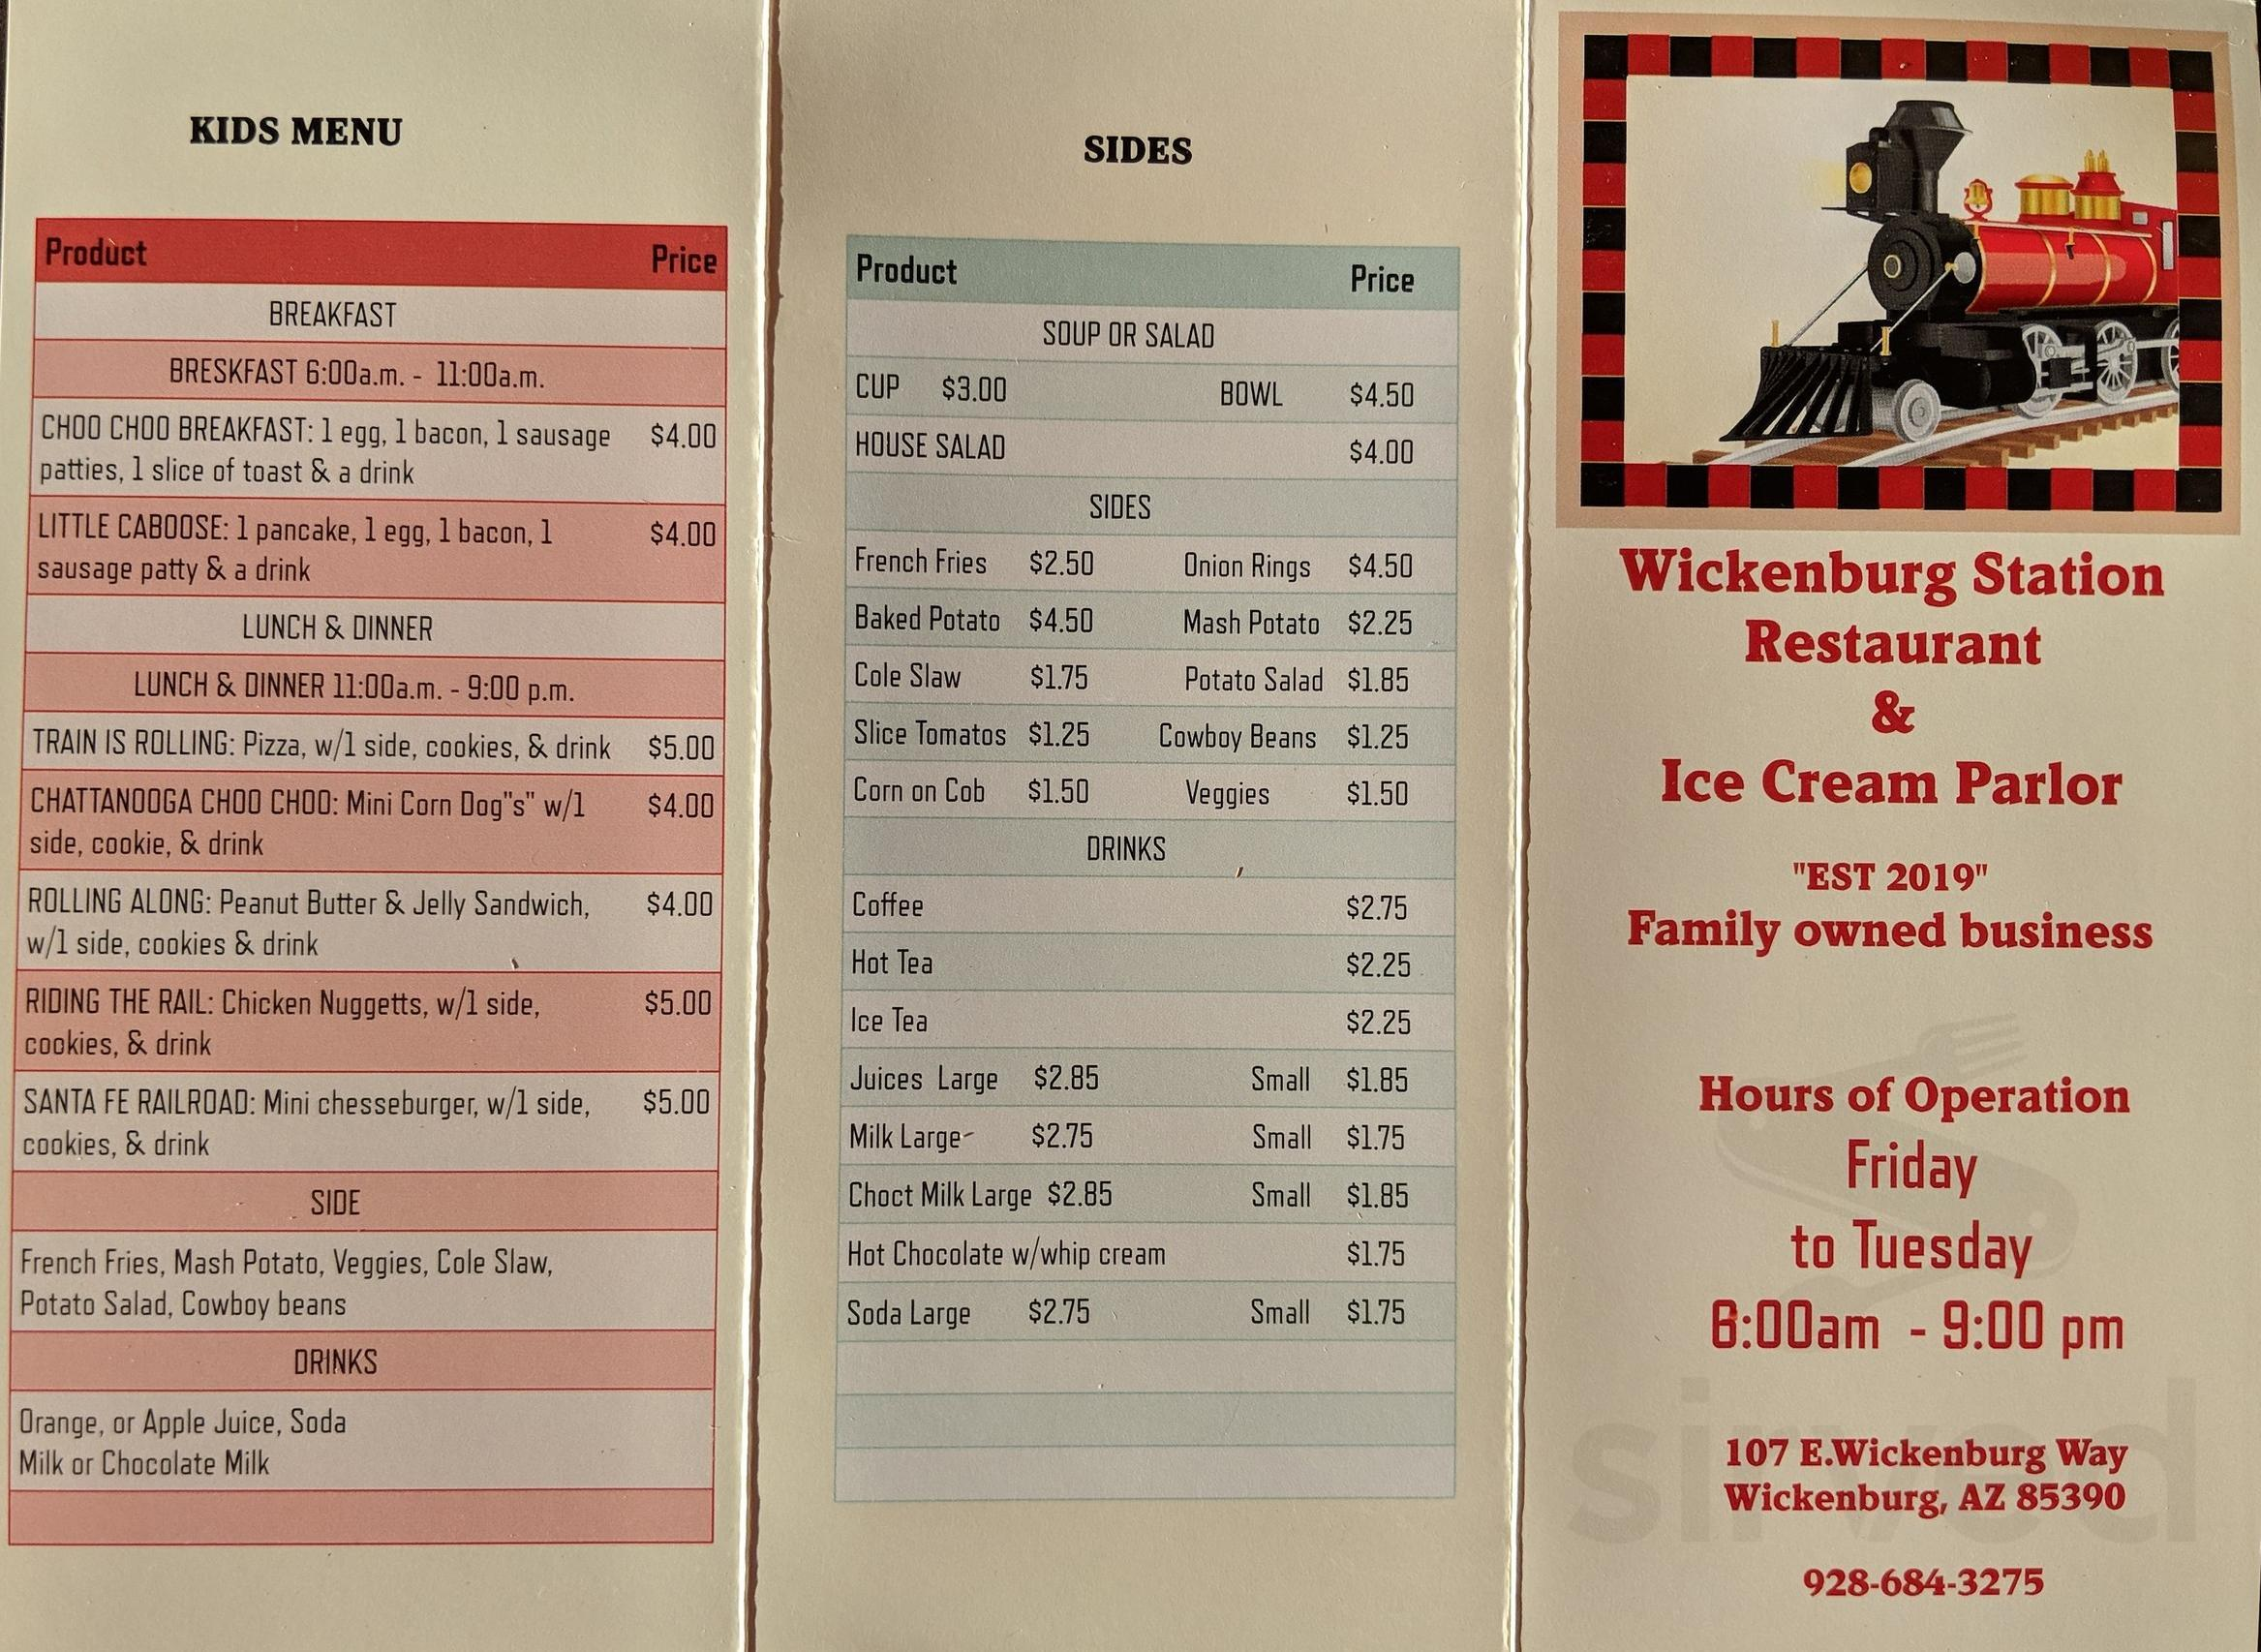 Menu For Wickenburg Station Restaurant Ice Cream Parlor In